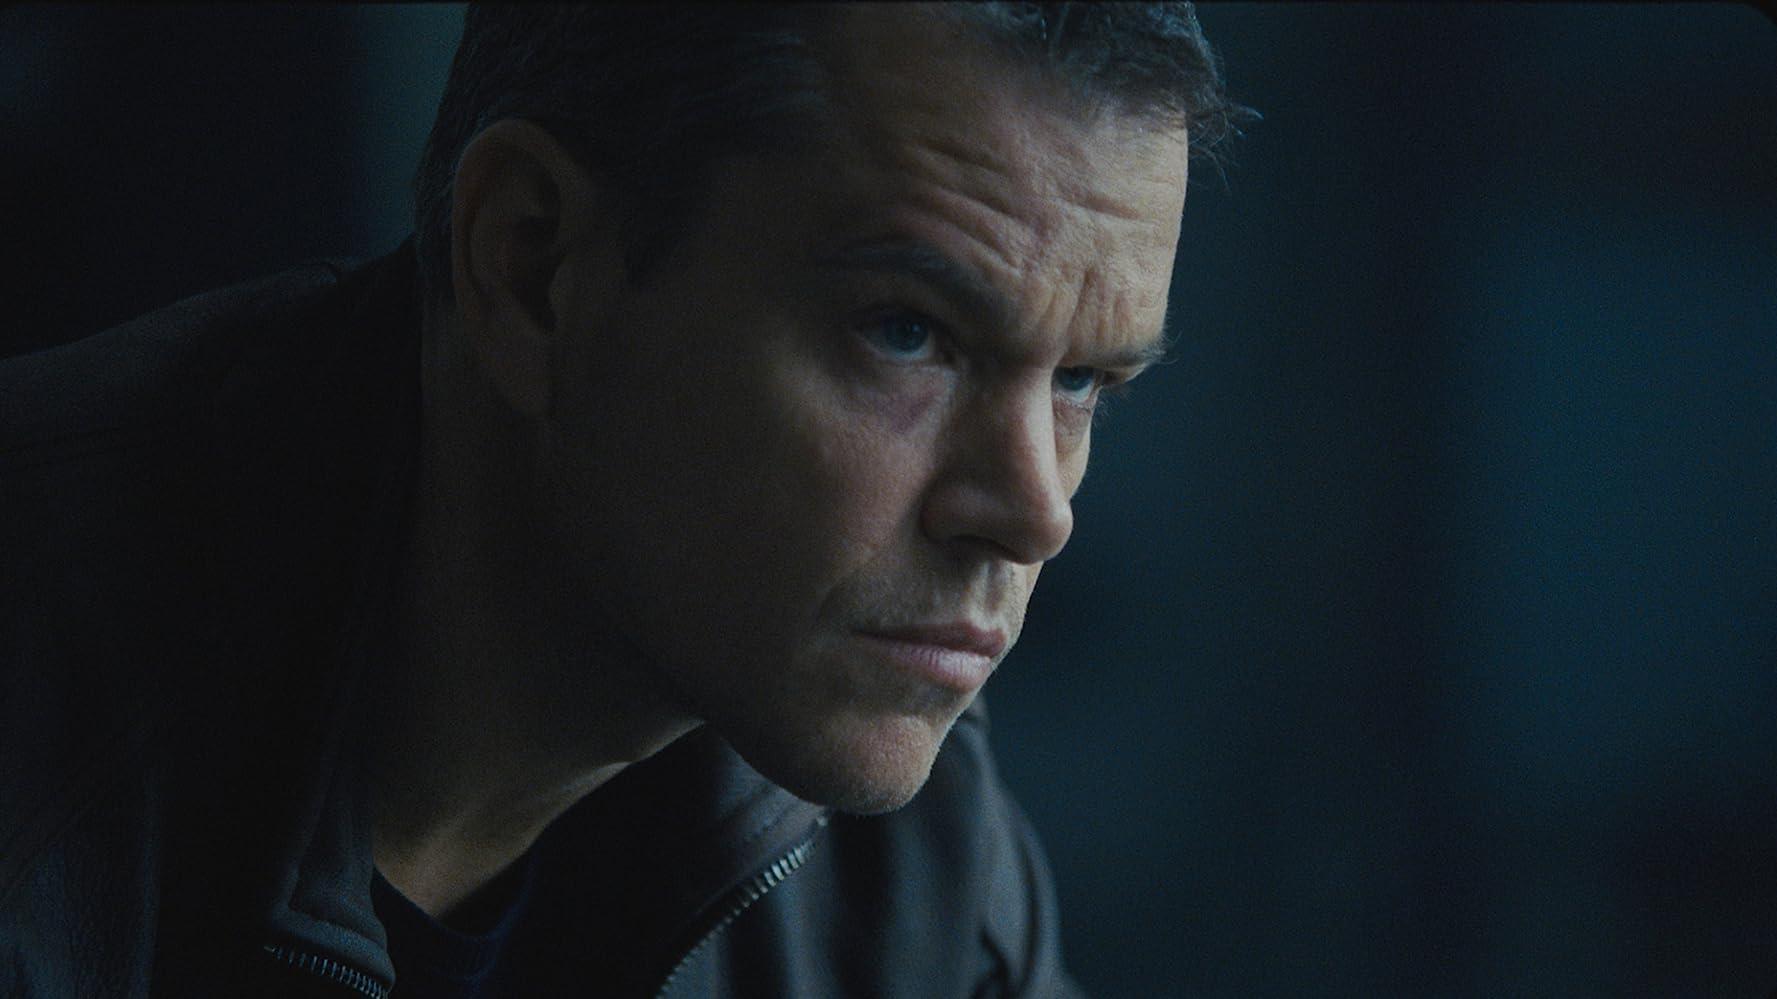 Matt Damon in Jason Bourne (2016)